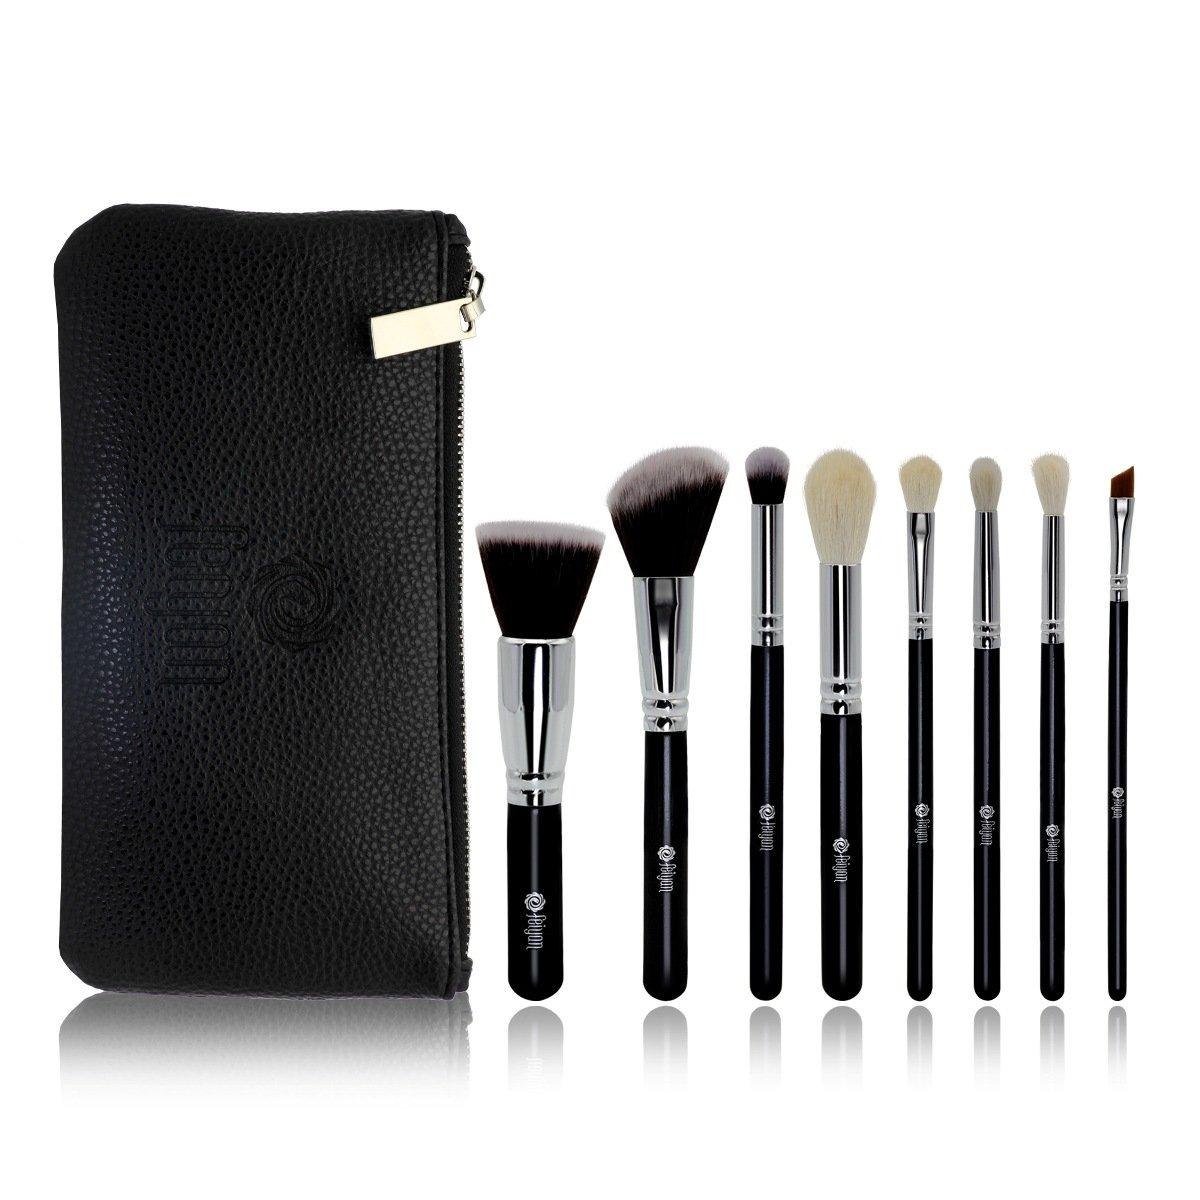 FEIYAN Makeup Brushes Set Natural Goat Hair Synthetic Makeup Brush Set Professional Kabuki Makeup Foundation Eyeliner Lip Powder Cosmetic Brushes Kit with Zipper Bag (8 pcs, Black1)